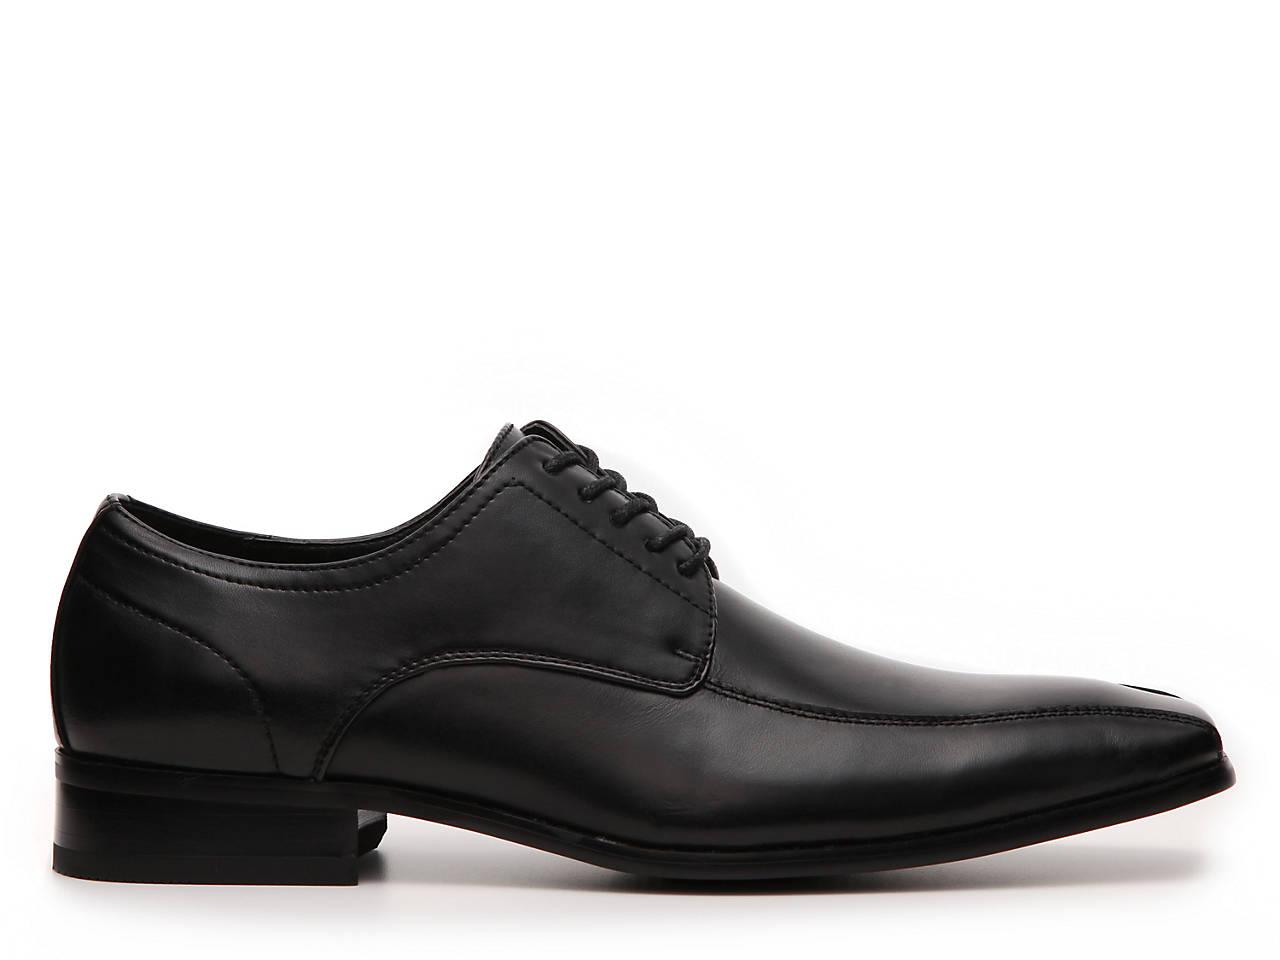 b308c391c6bb84 Perry Ellis Portfolio Stanley Oxford Men s Shoes